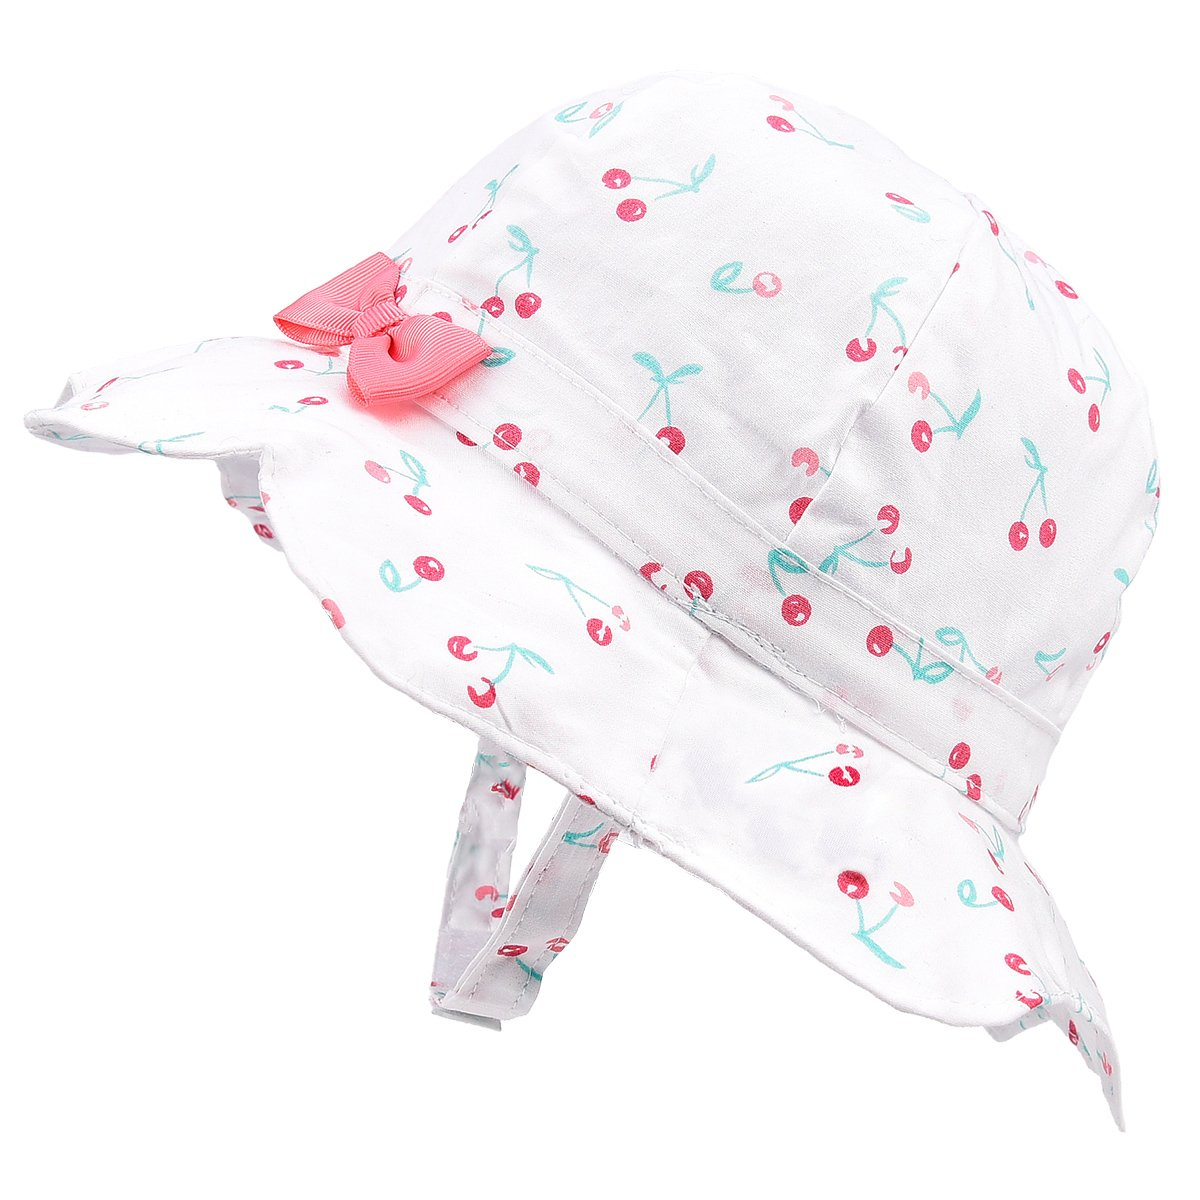 SOMALER Baby Girls Summer Sun Hat Toddler Kids Spring Lightweight Foldable Cotton Cap